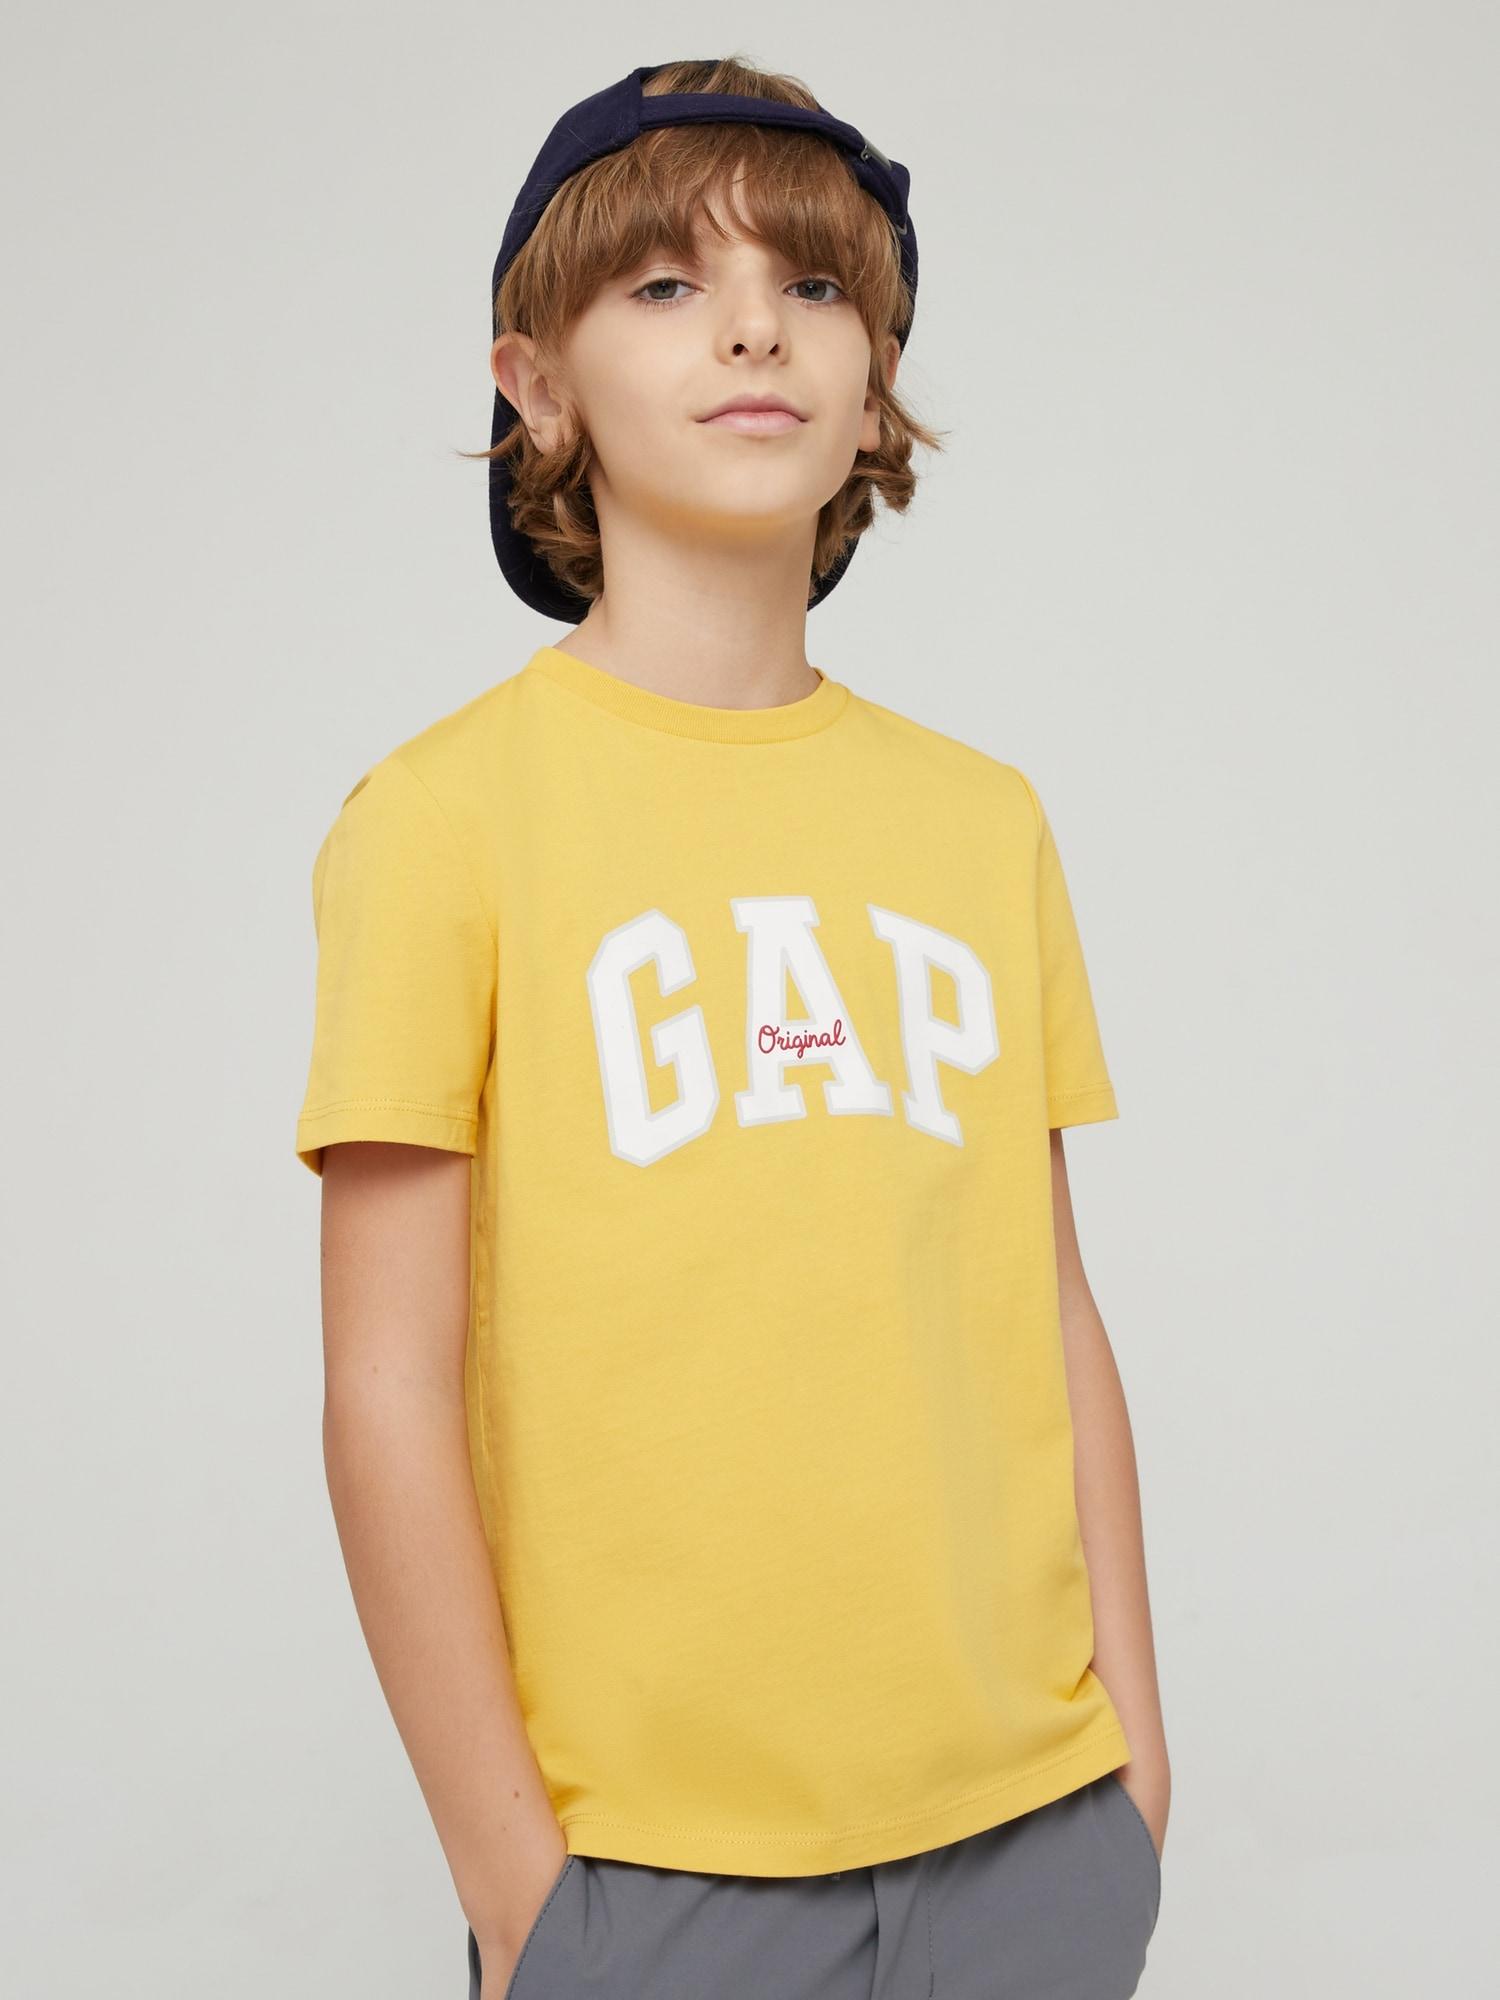 Gapロゴ クルーネックtシャツ